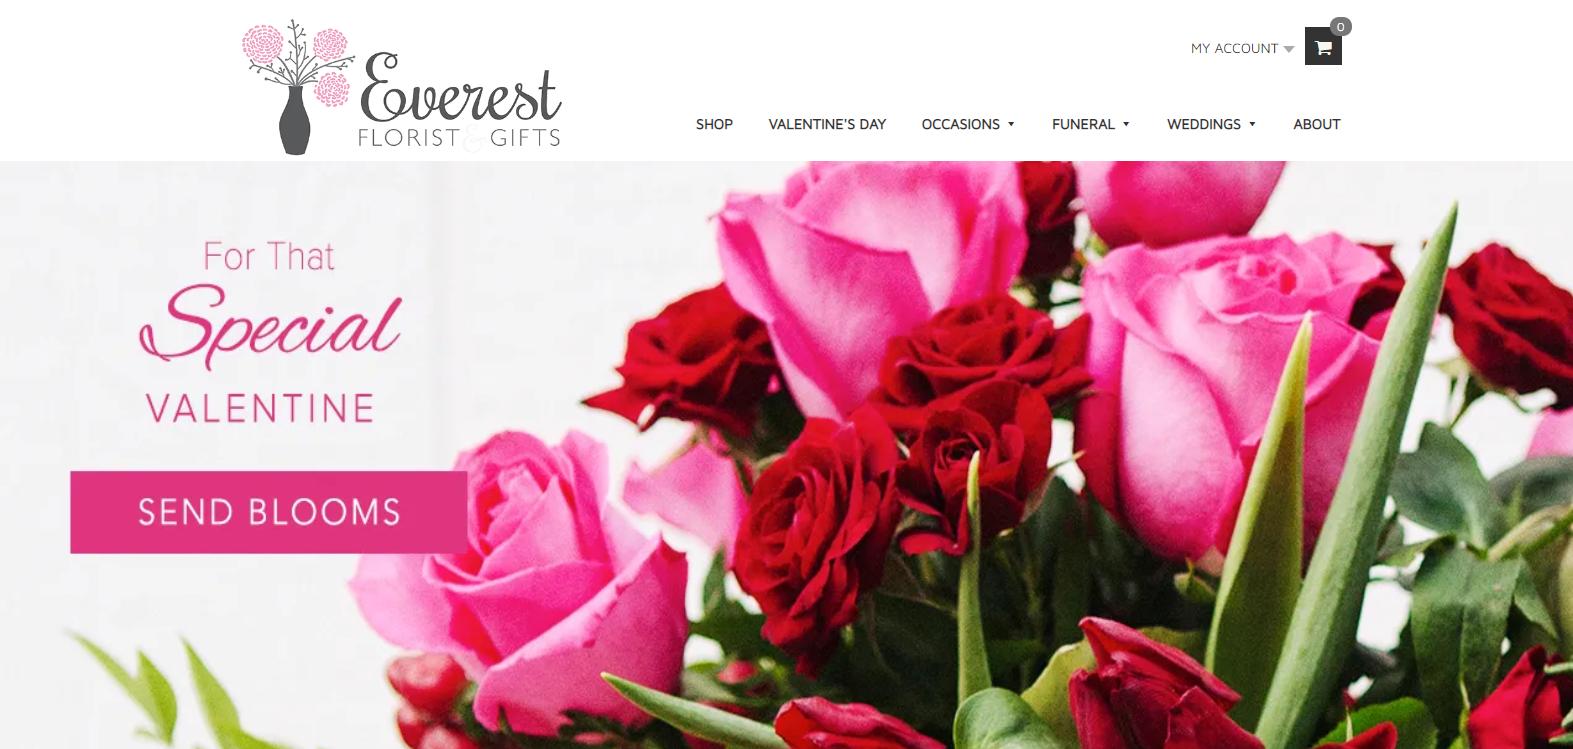 Everest Florist and Gifts Sacramento CA